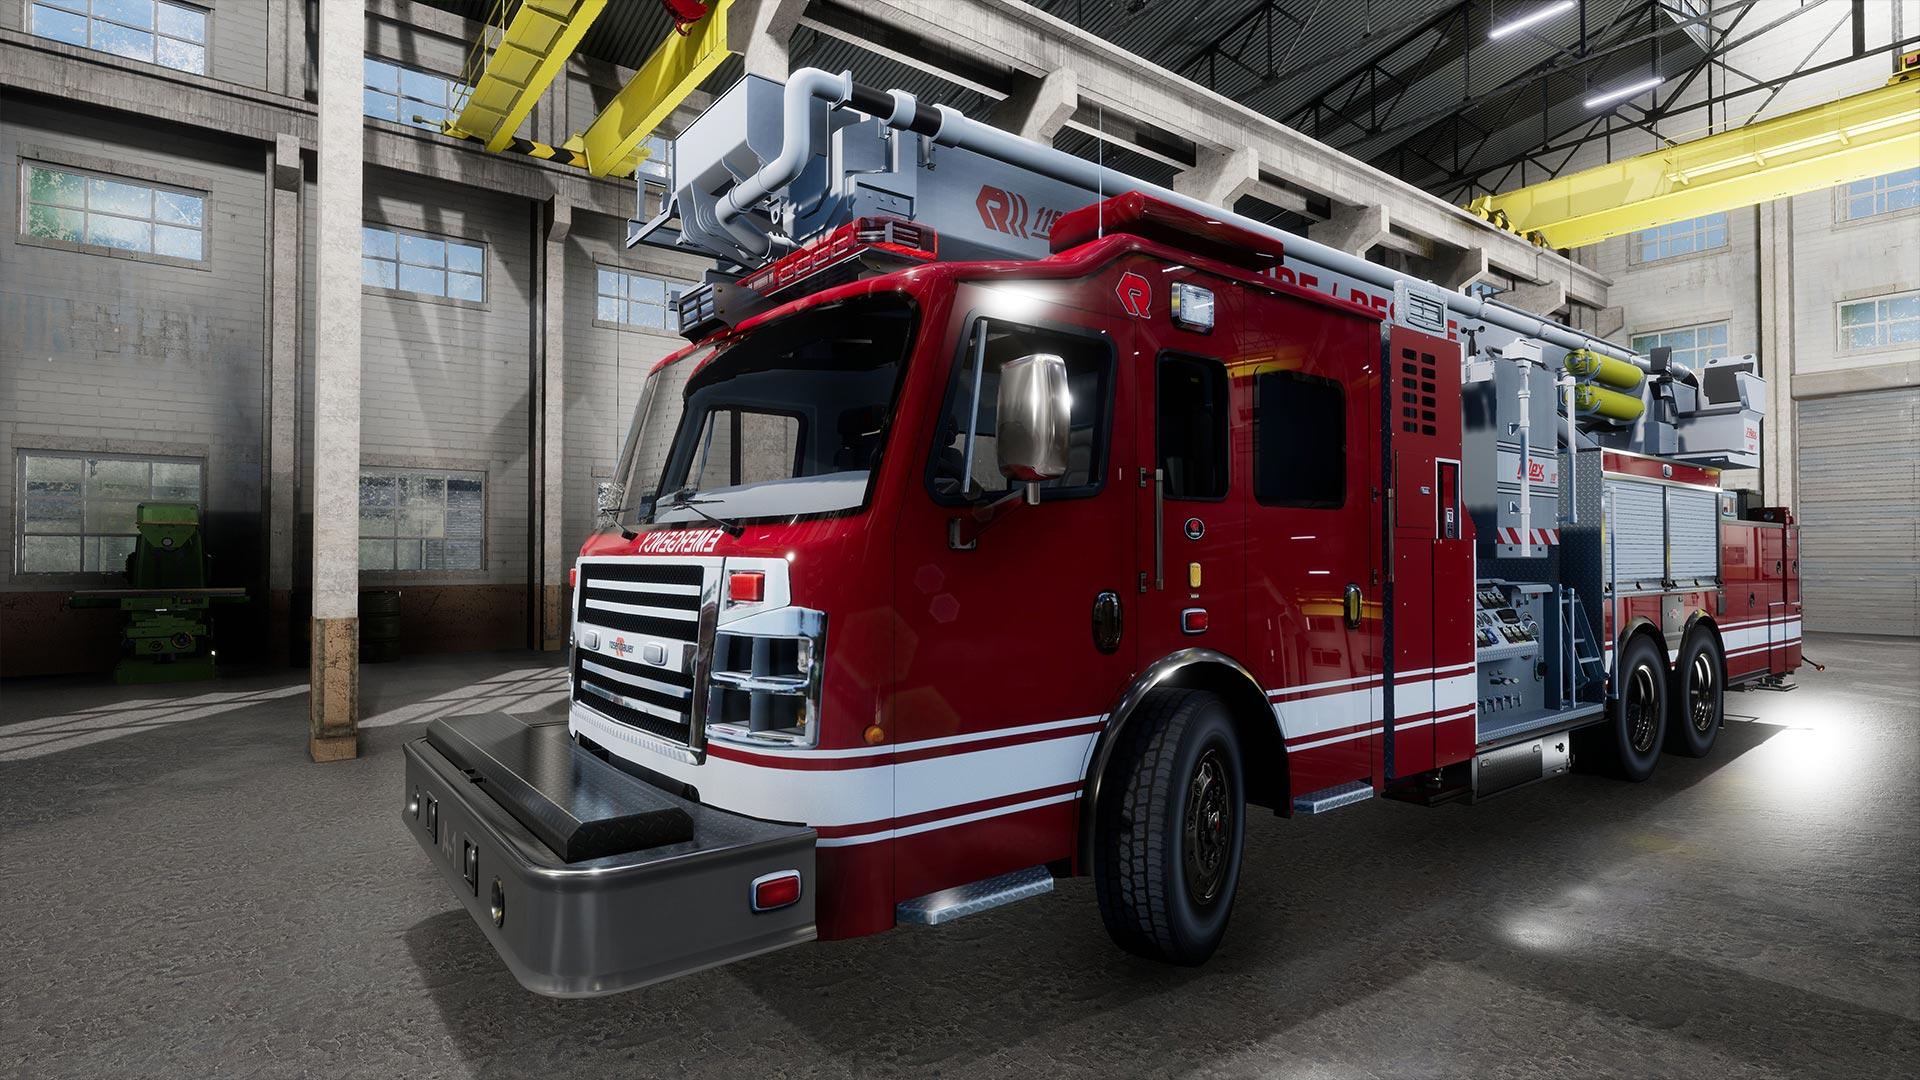 Firefighting Simulator - Coming 2020 on PC